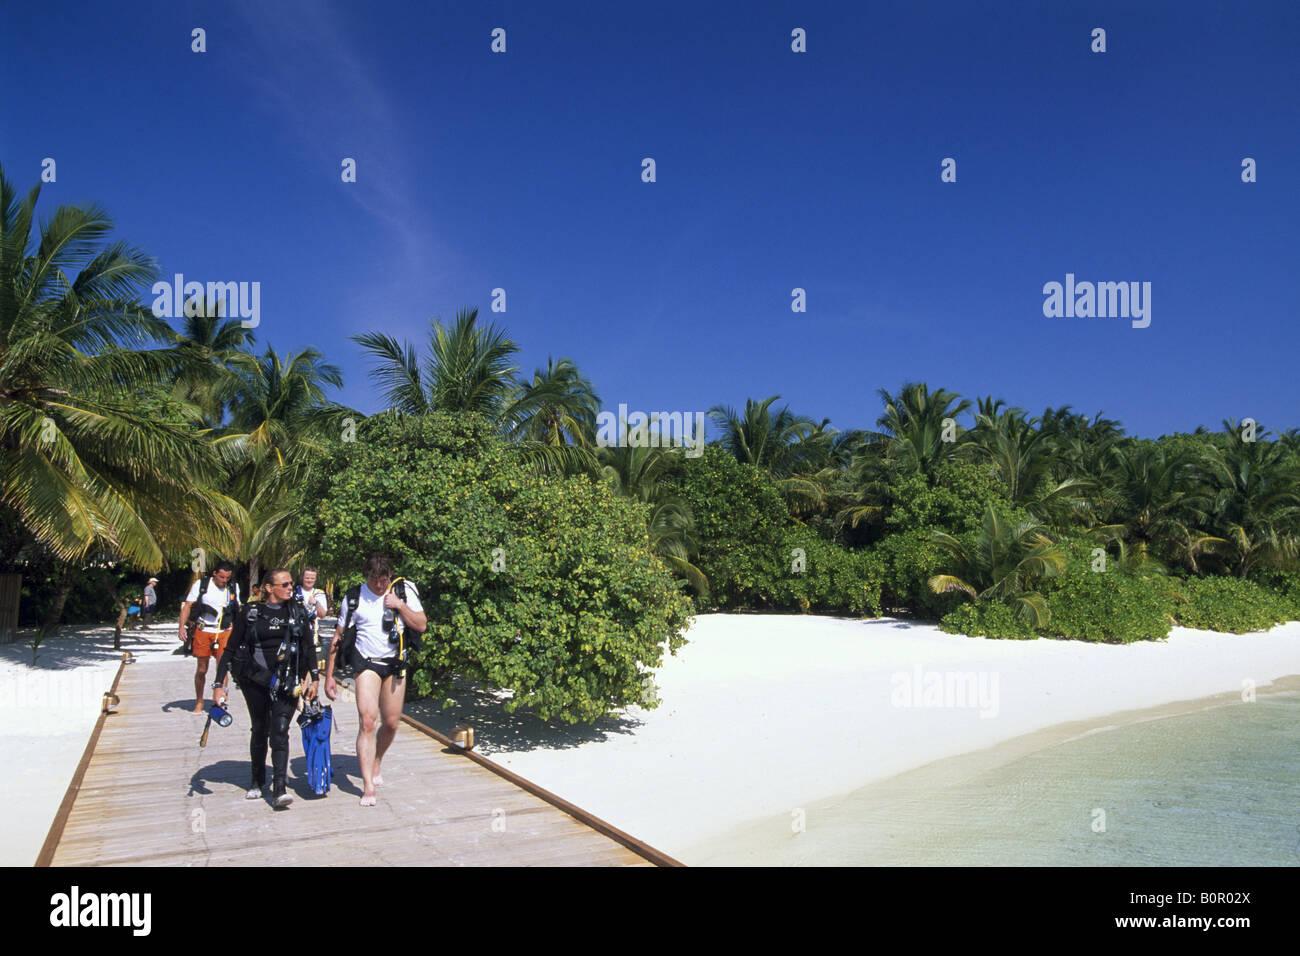 Taucher Insel Baros Malediven - Stock Image